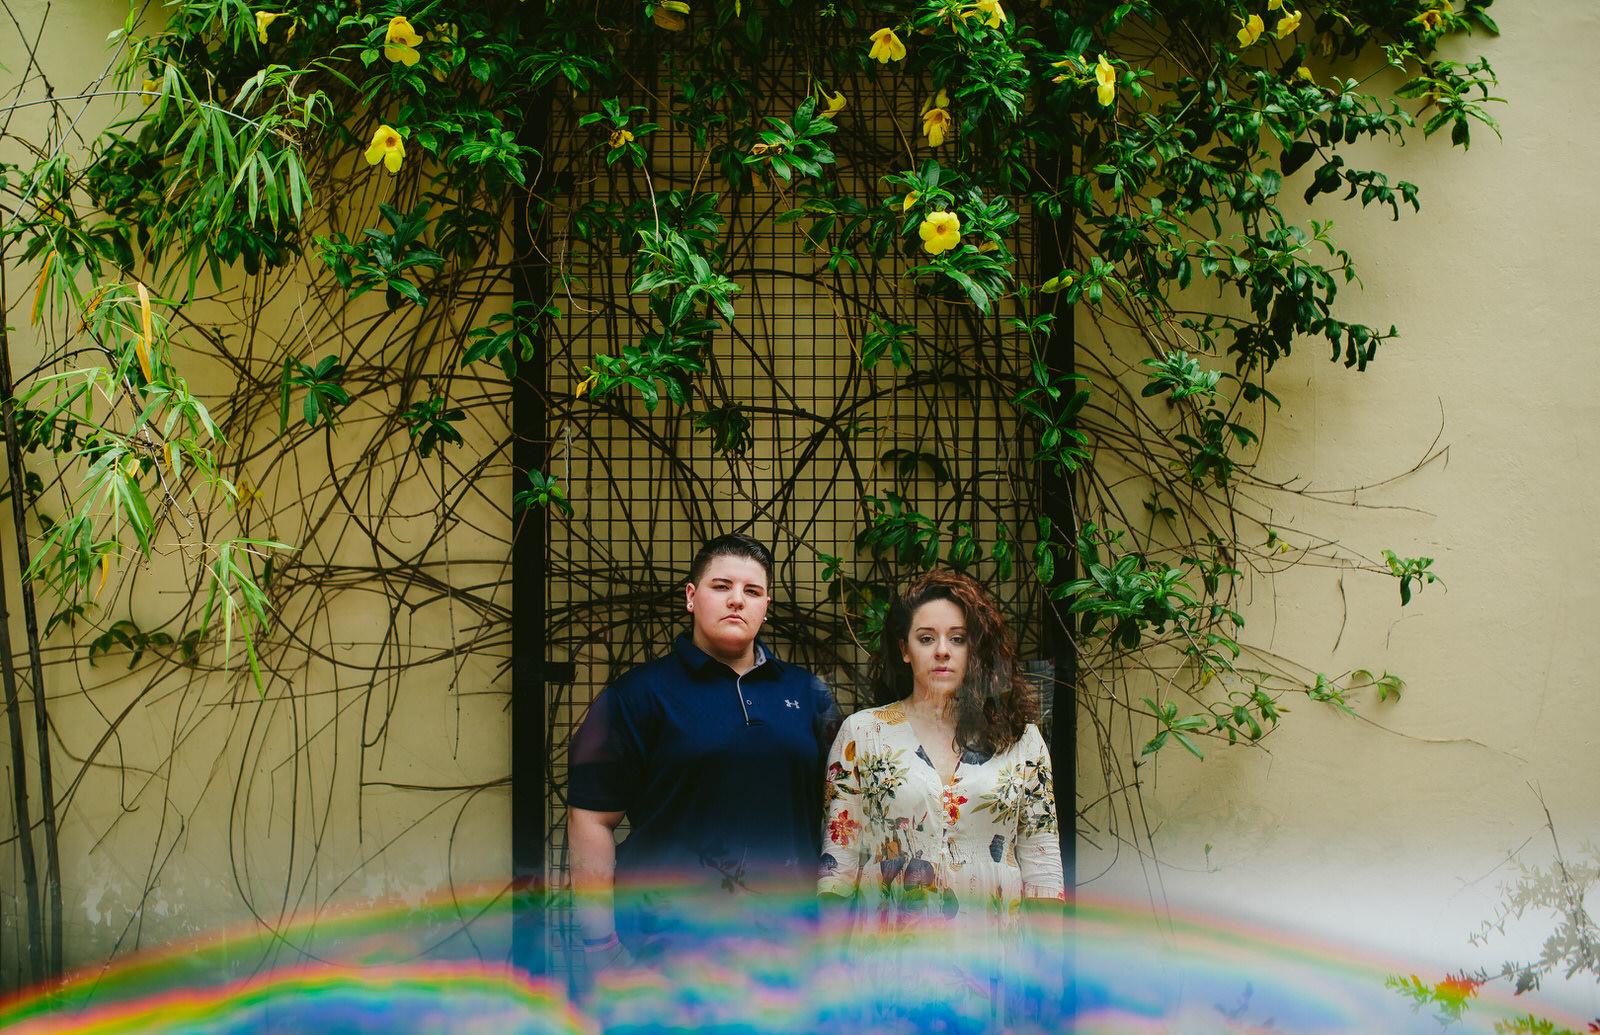 LGBTQ couple engagement portraits LOVE IS LOVE